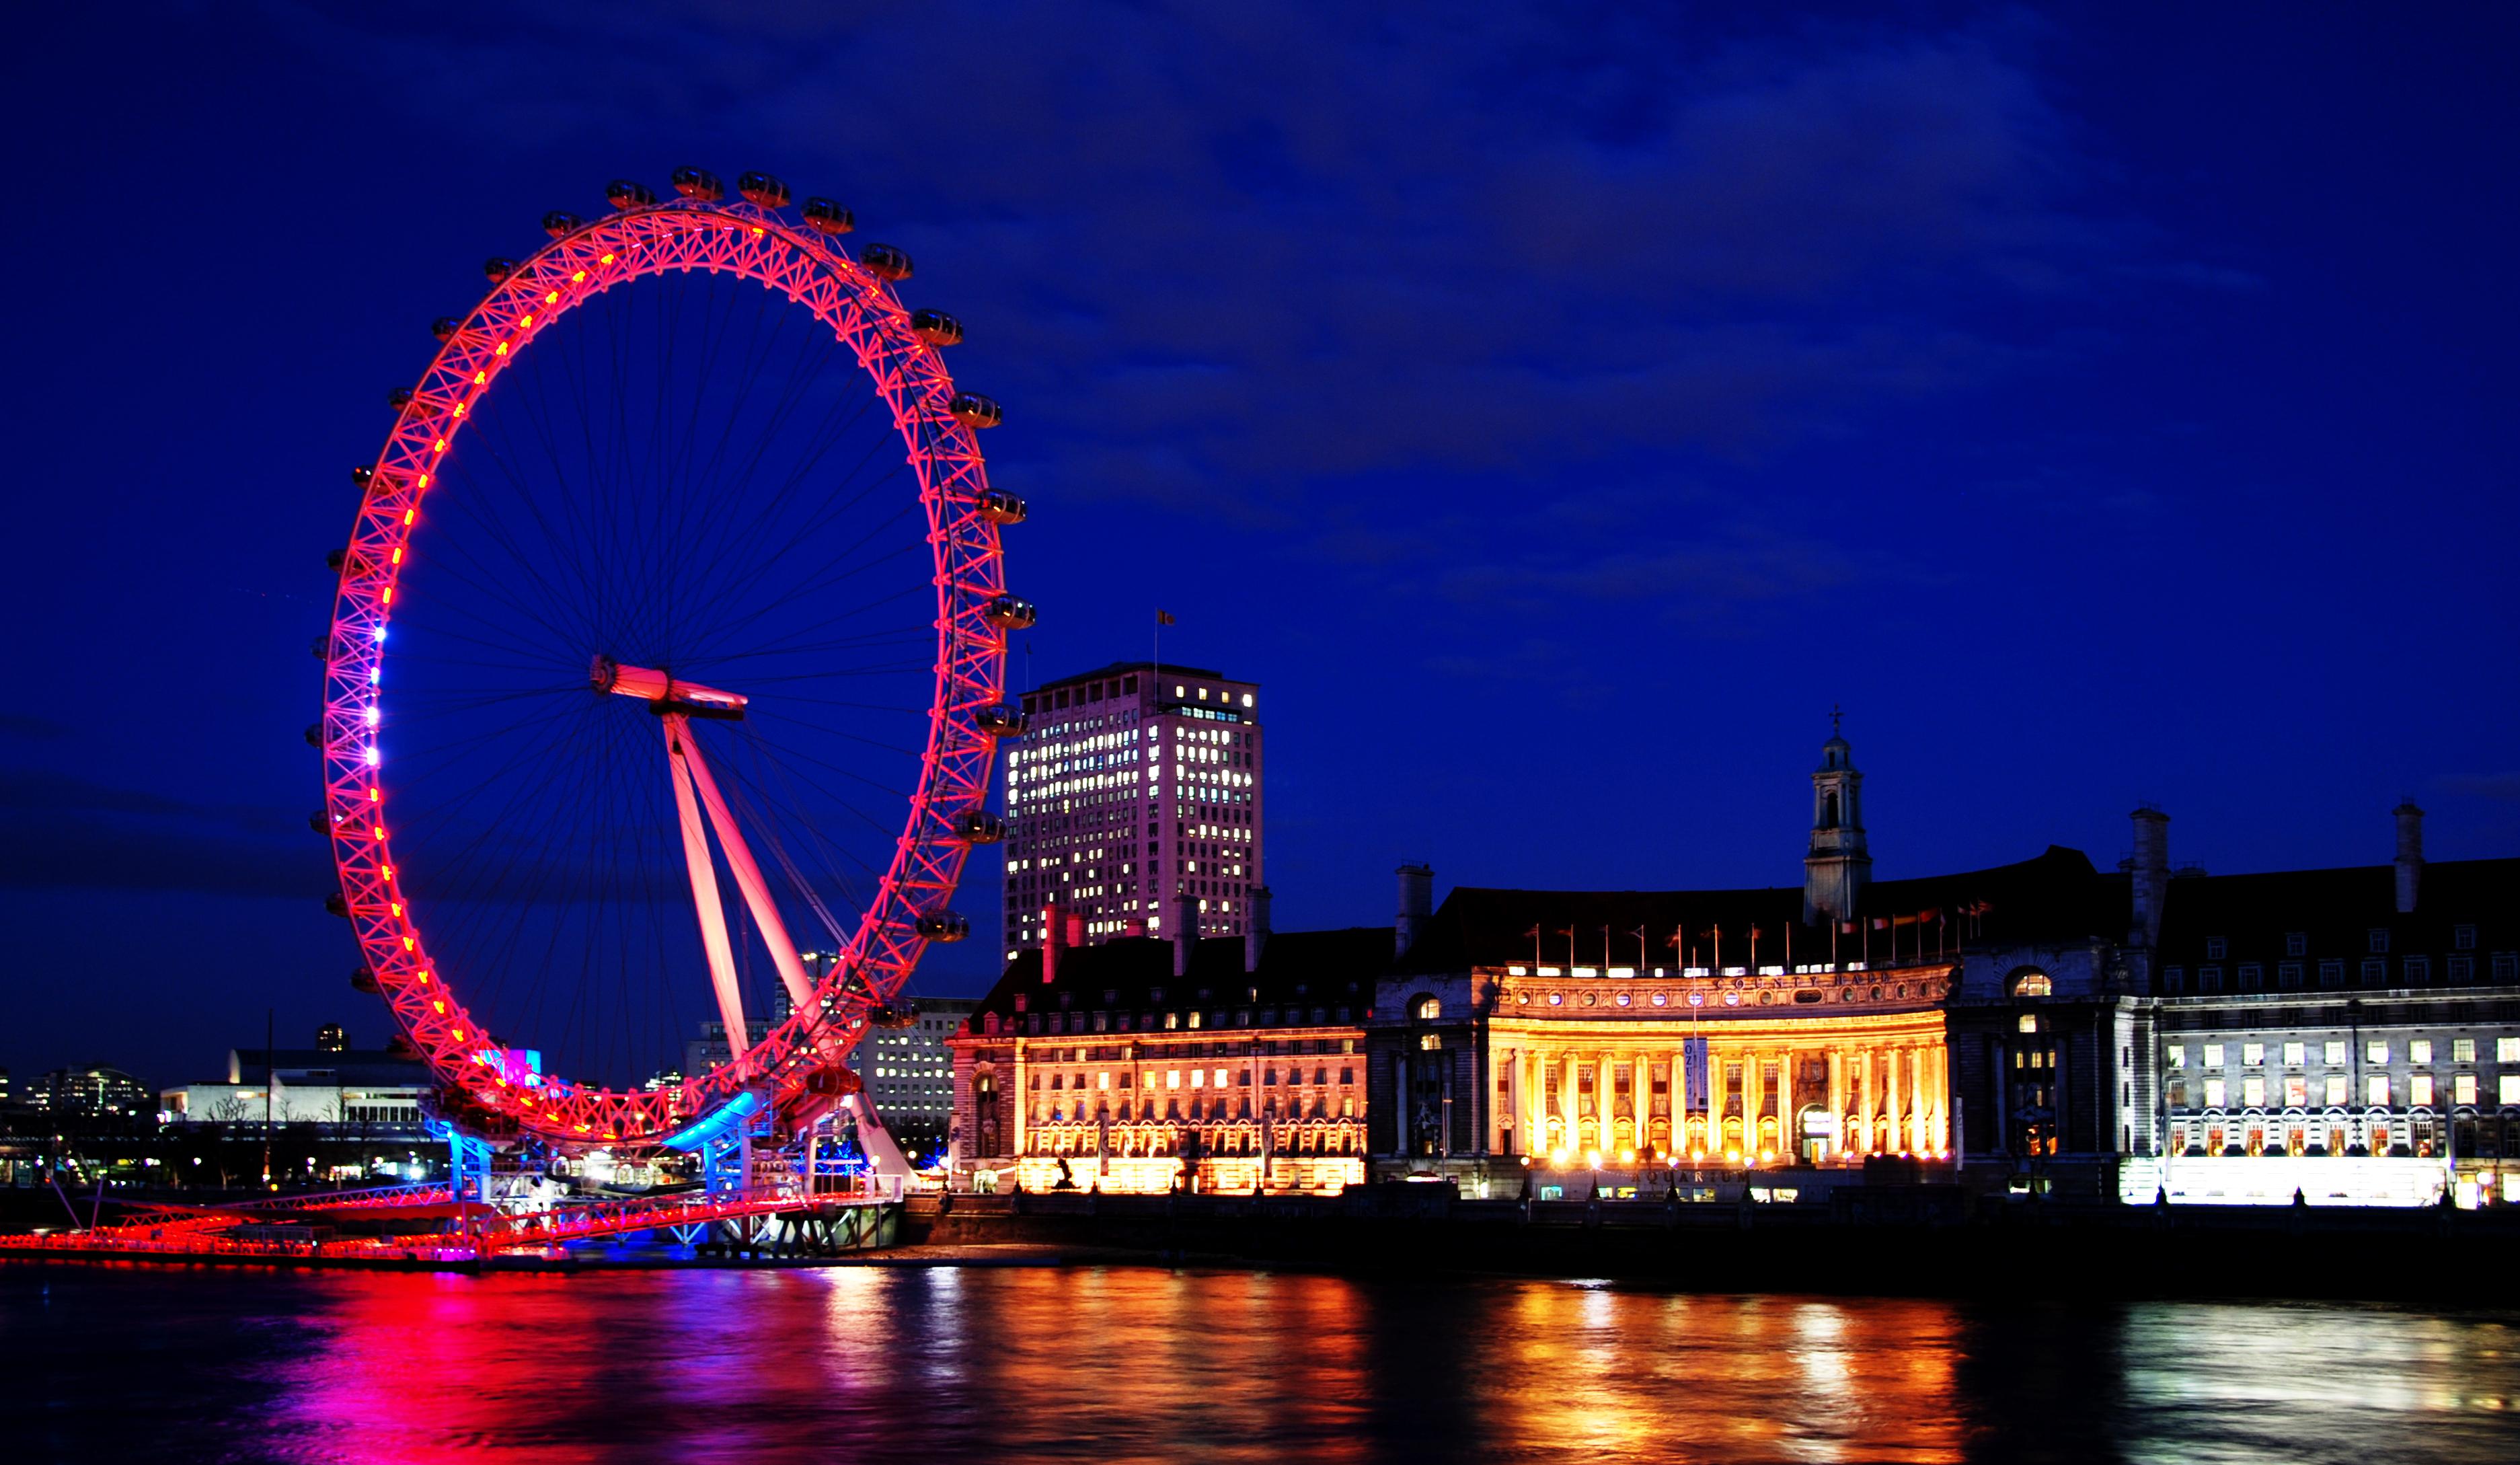 red light on london eye at night